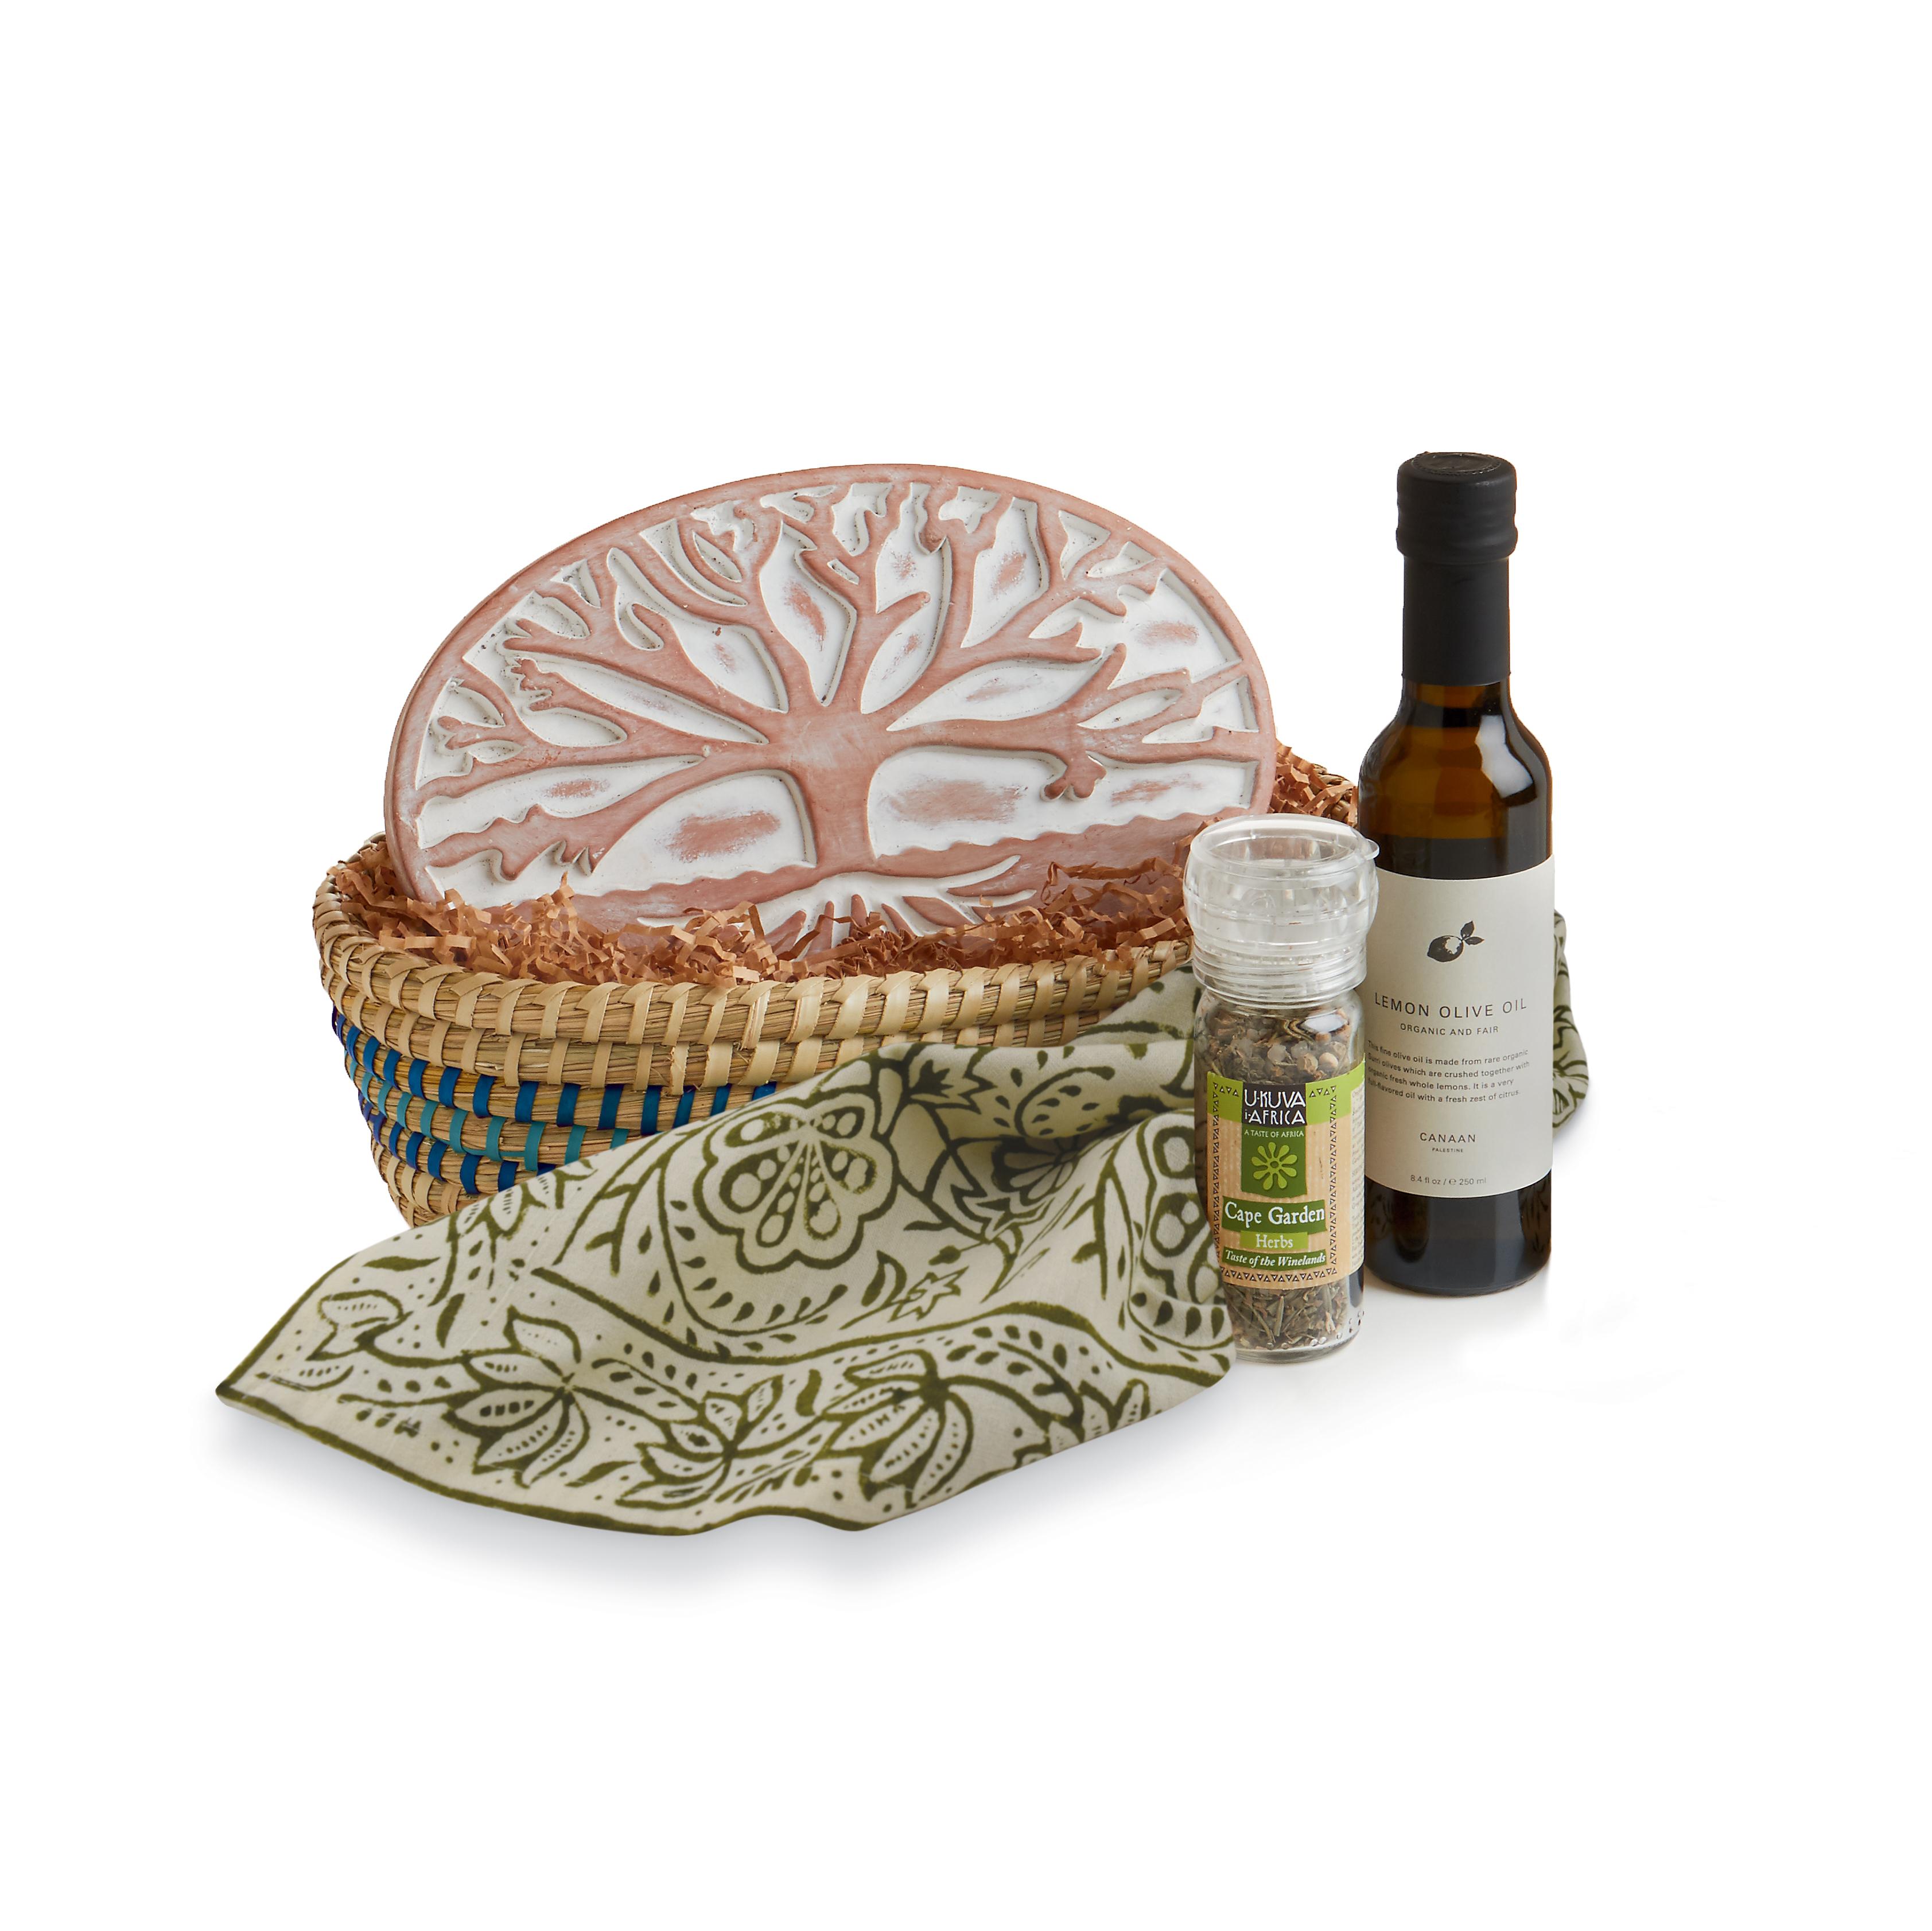 Bread Lovers Gift Basket